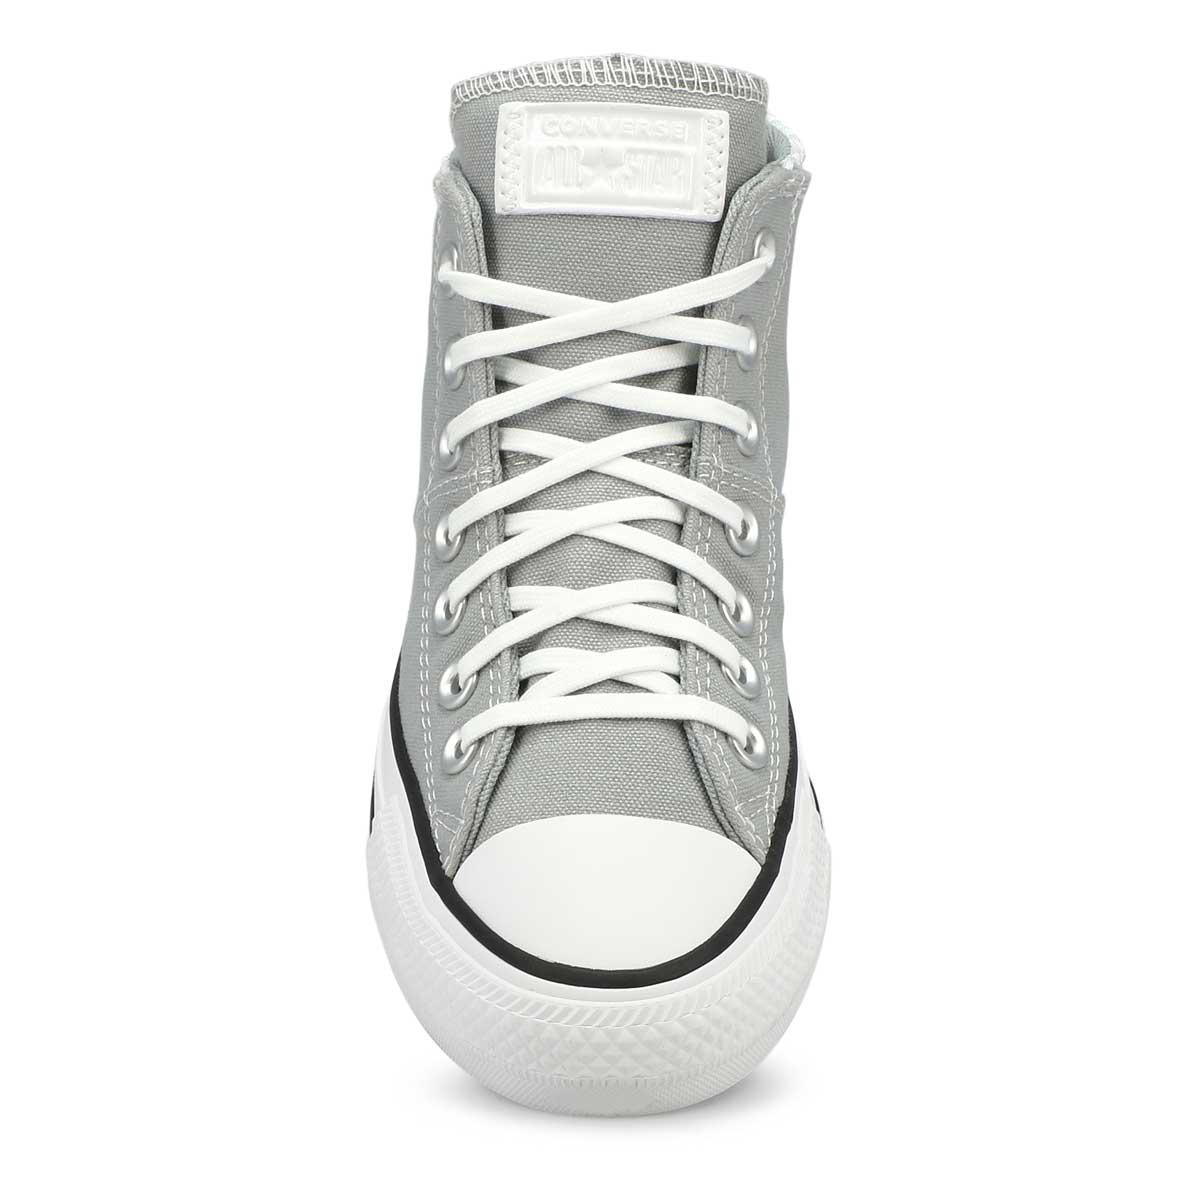 Women's All Star Madison Sneaker - Ash Stone/White